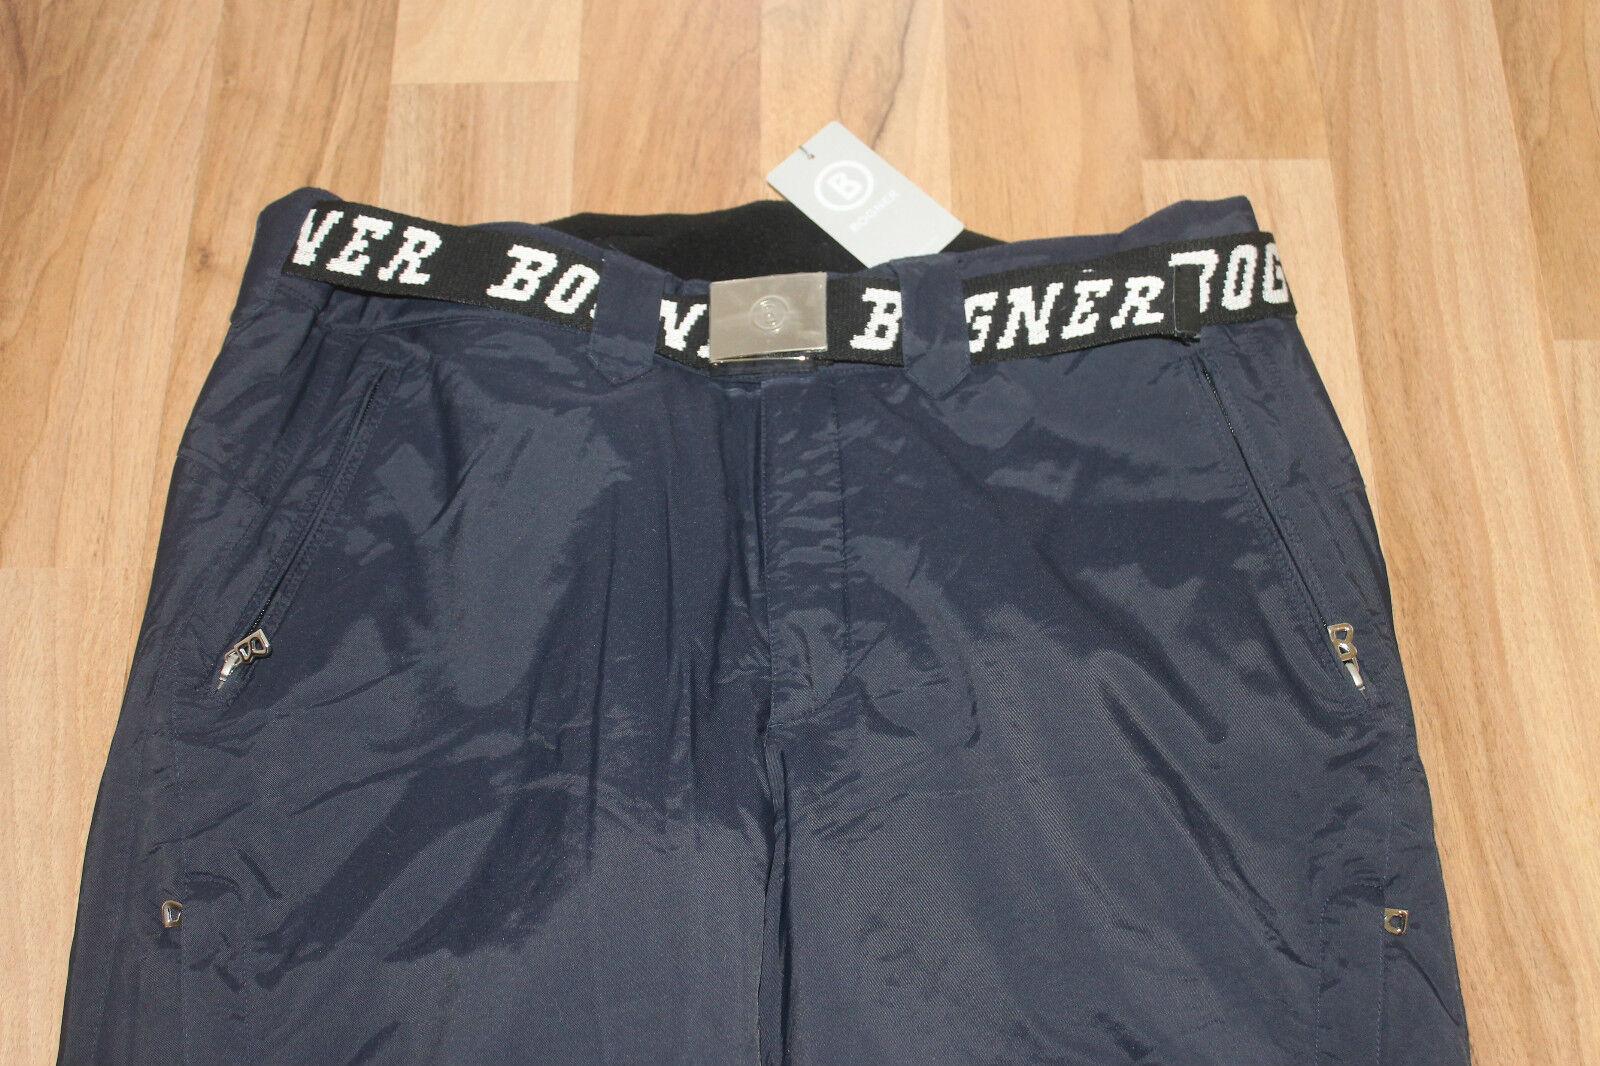 Bogner Uomo Sci Pantaloni Rik T Blu Navy Taglia XL, XXL o XXXL nuovo con etichetta